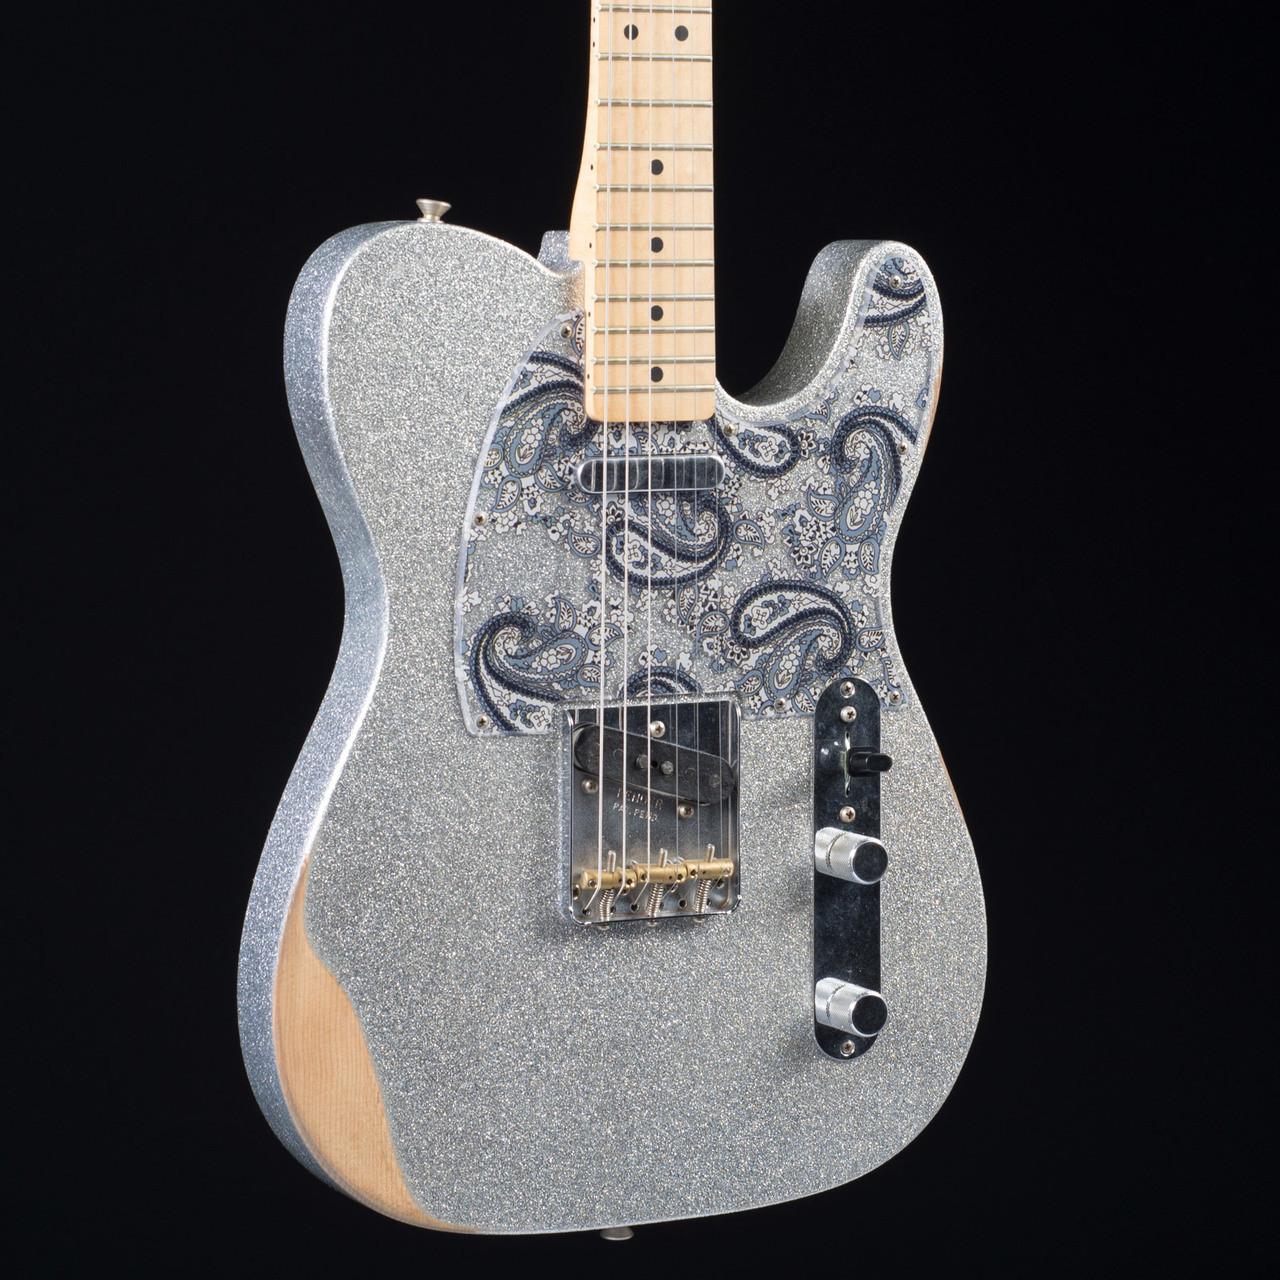 fender brad paisley road worn telecaster silver sparkle 6840 at moore music. Black Bedroom Furniture Sets. Home Design Ideas